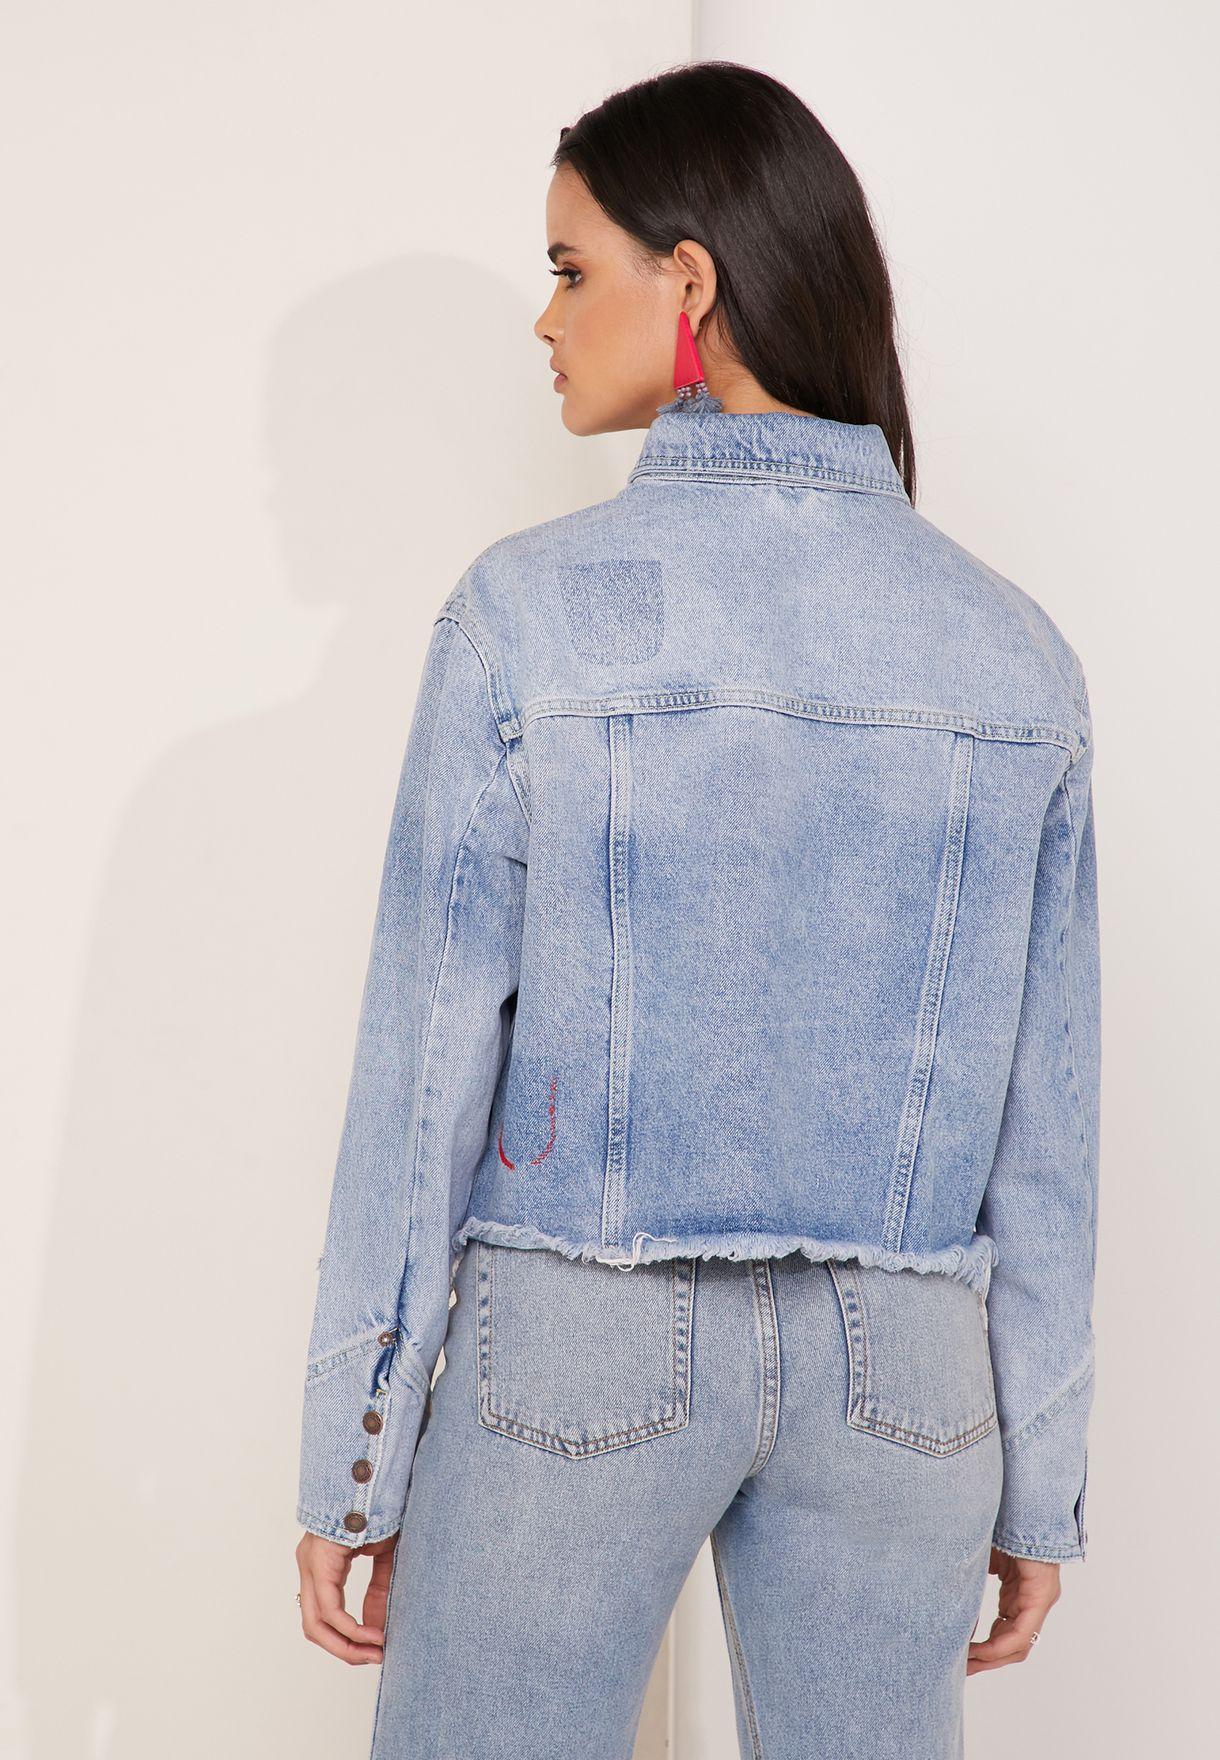 Dilon Stud Pleat Detail Denim Jacket